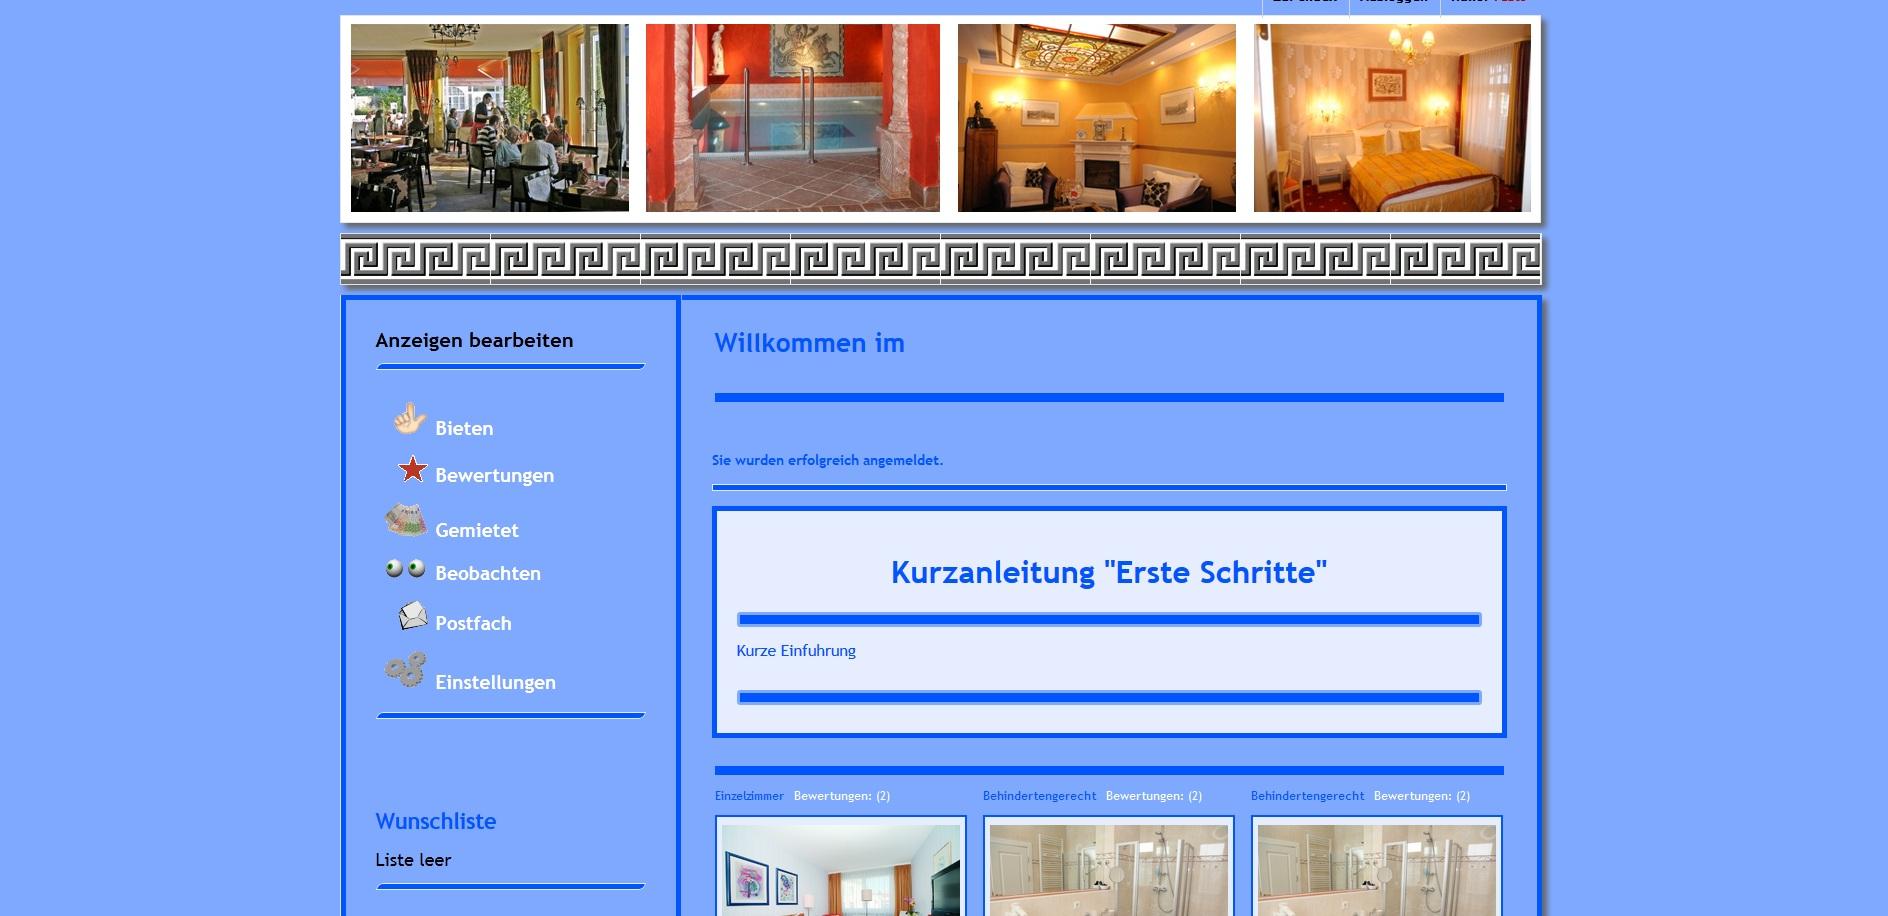 Hotelmanagementsoftware101